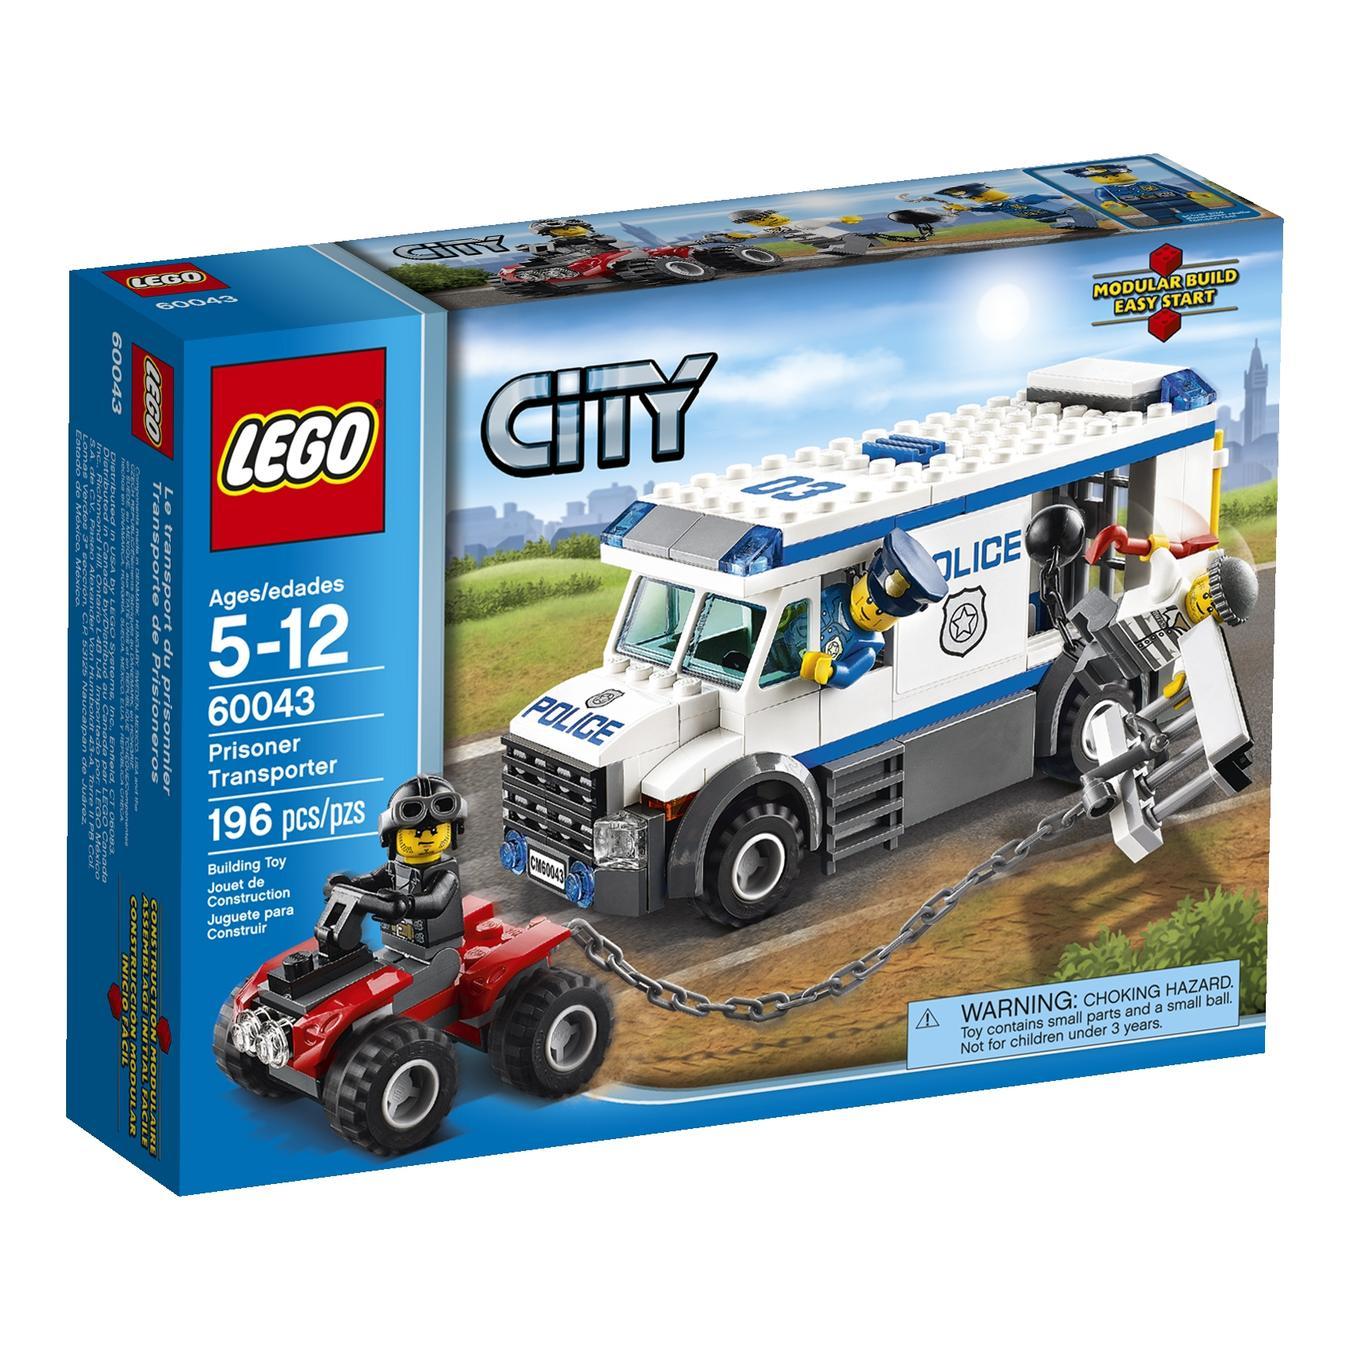 Construction Toy Lego City Police Prisoner Transporter For 5 To 12